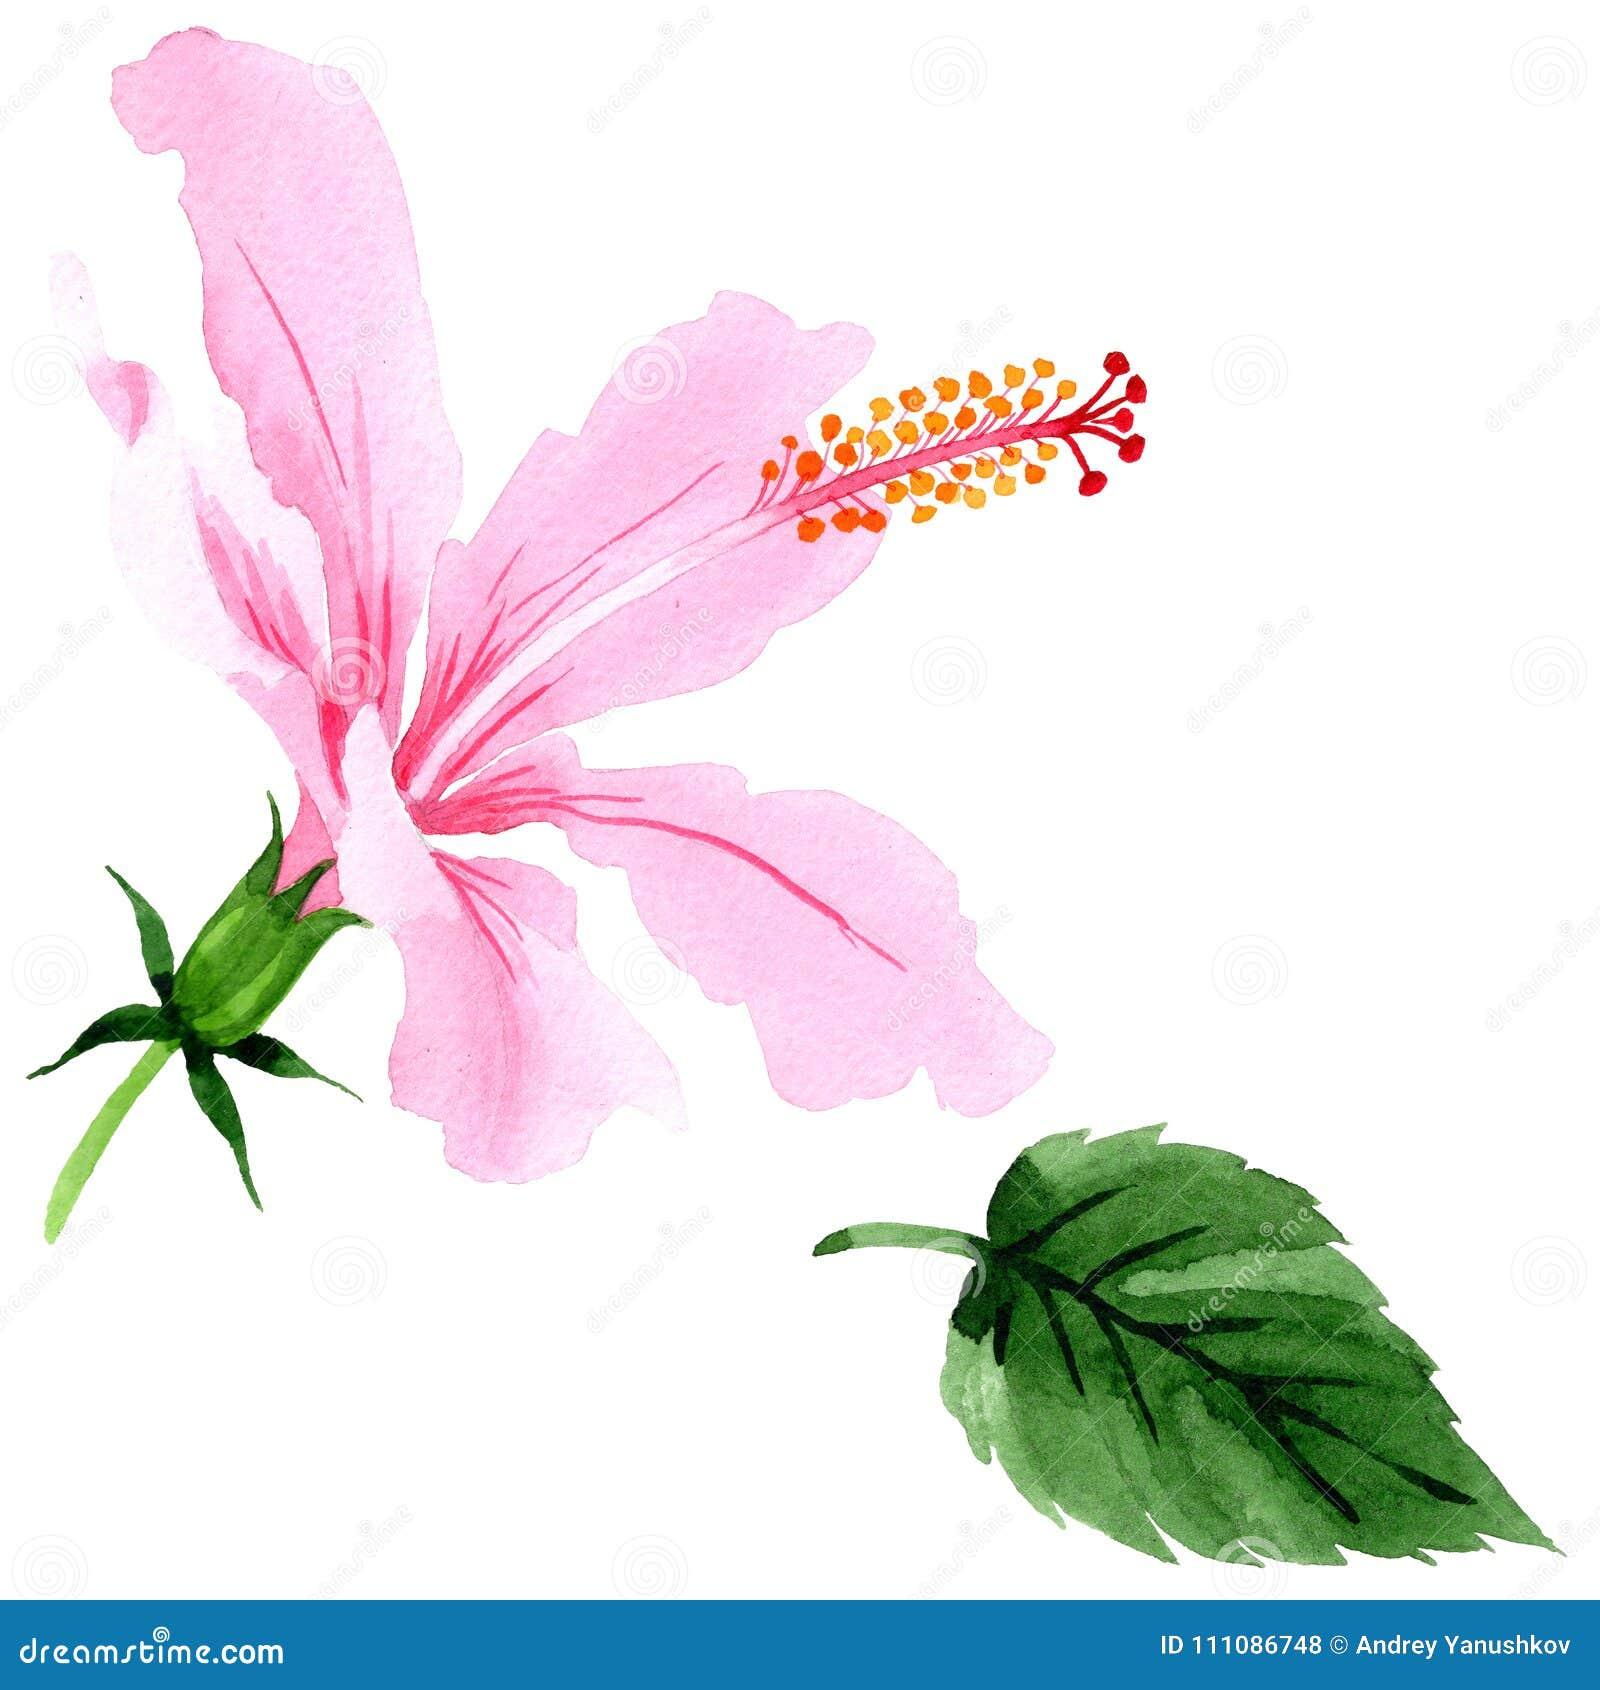 Wildflower hibiscus pink flower in a watercolor style isolated wildflower hibiscus pink flower in a watercolor style isolated full name of the plant hibiscus aquarelle wild flower for background texture izmirmasajfo